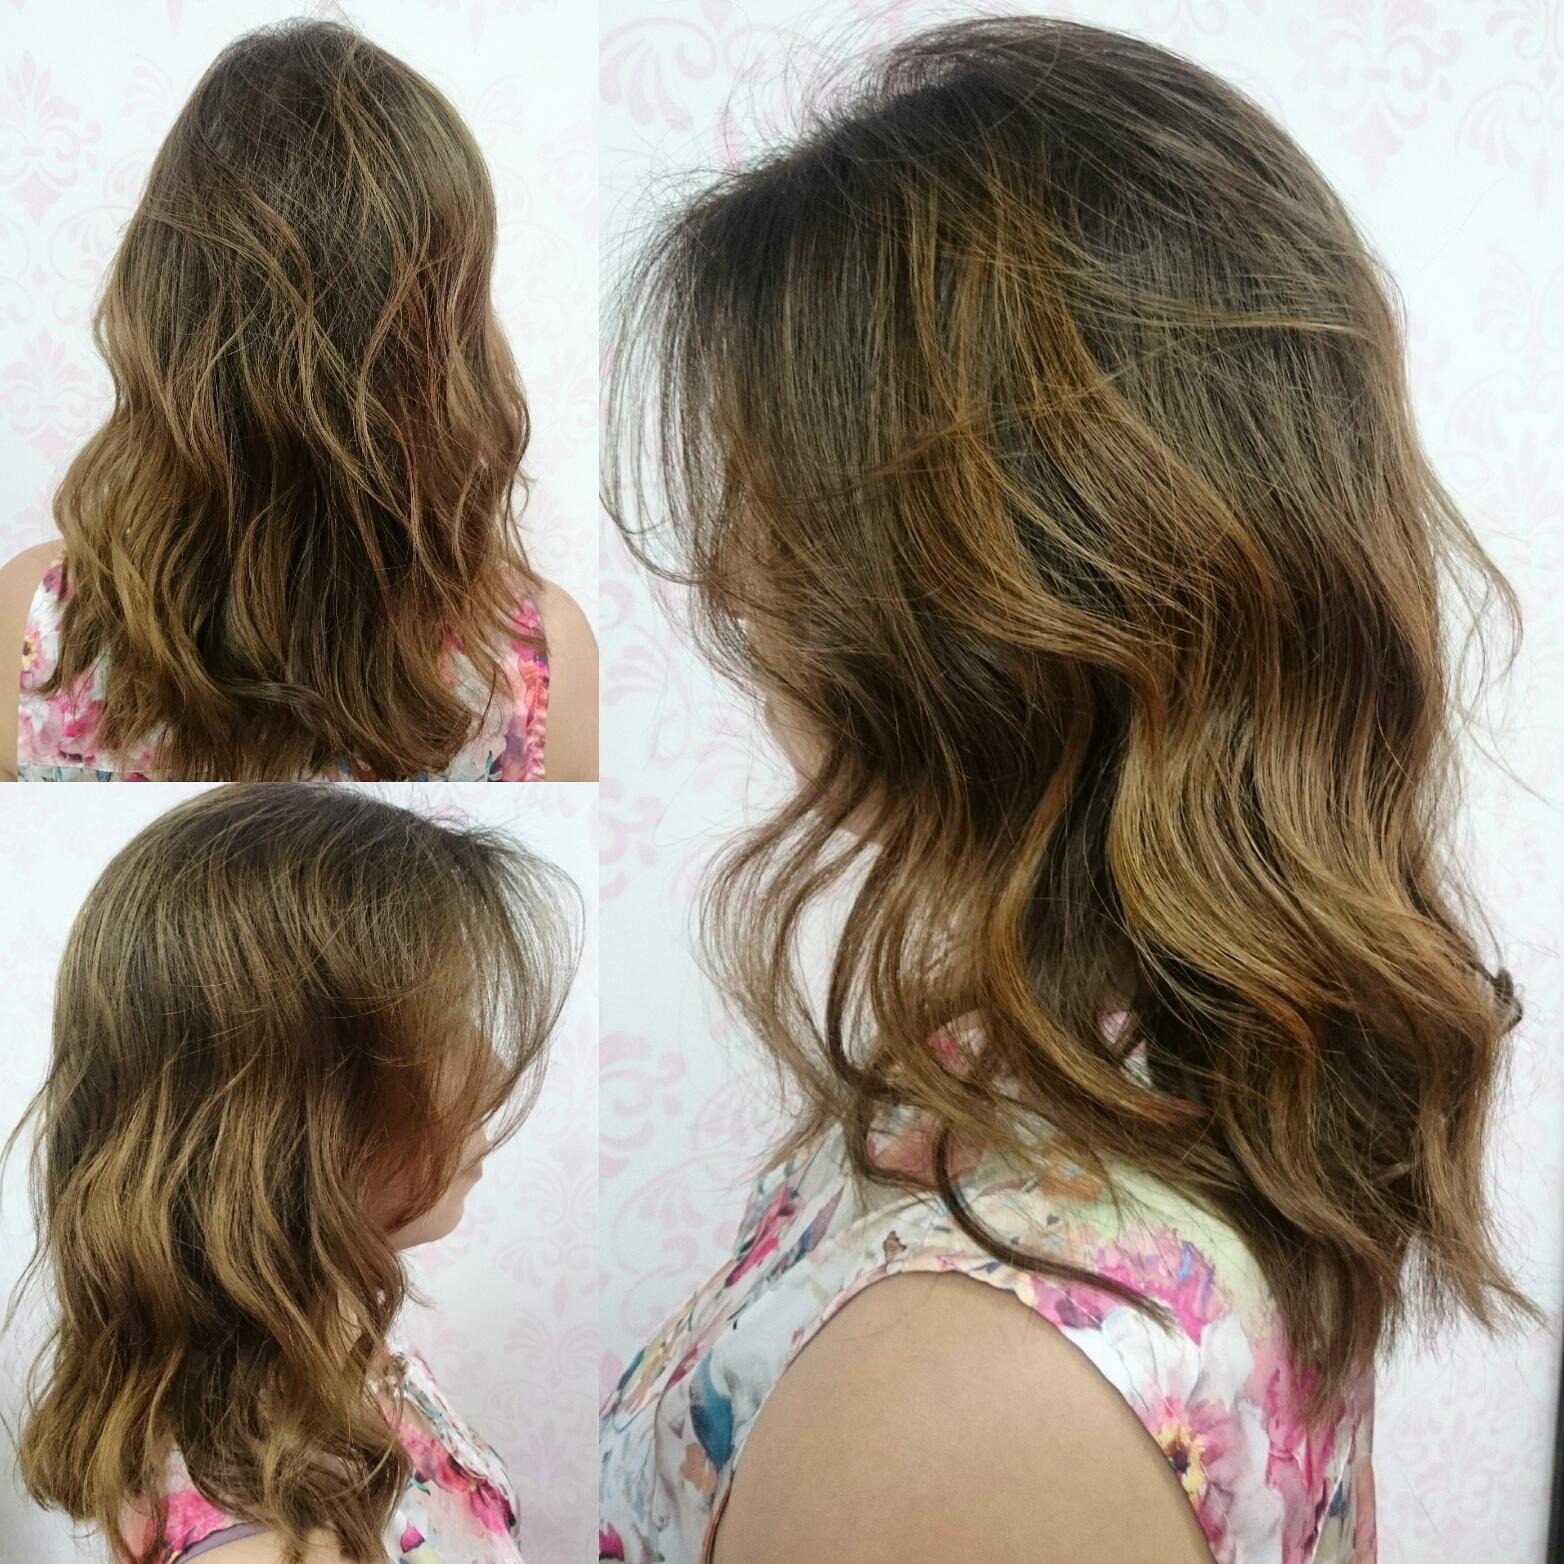 #job #transformation #transformacao #cabelos #cabelosloiros #morenailuminada #brunette #loirosacobreados #canelatostada #blonde  #hair cabelo cabeleireiro(a) maquiador(a) designer de sobrancelhas